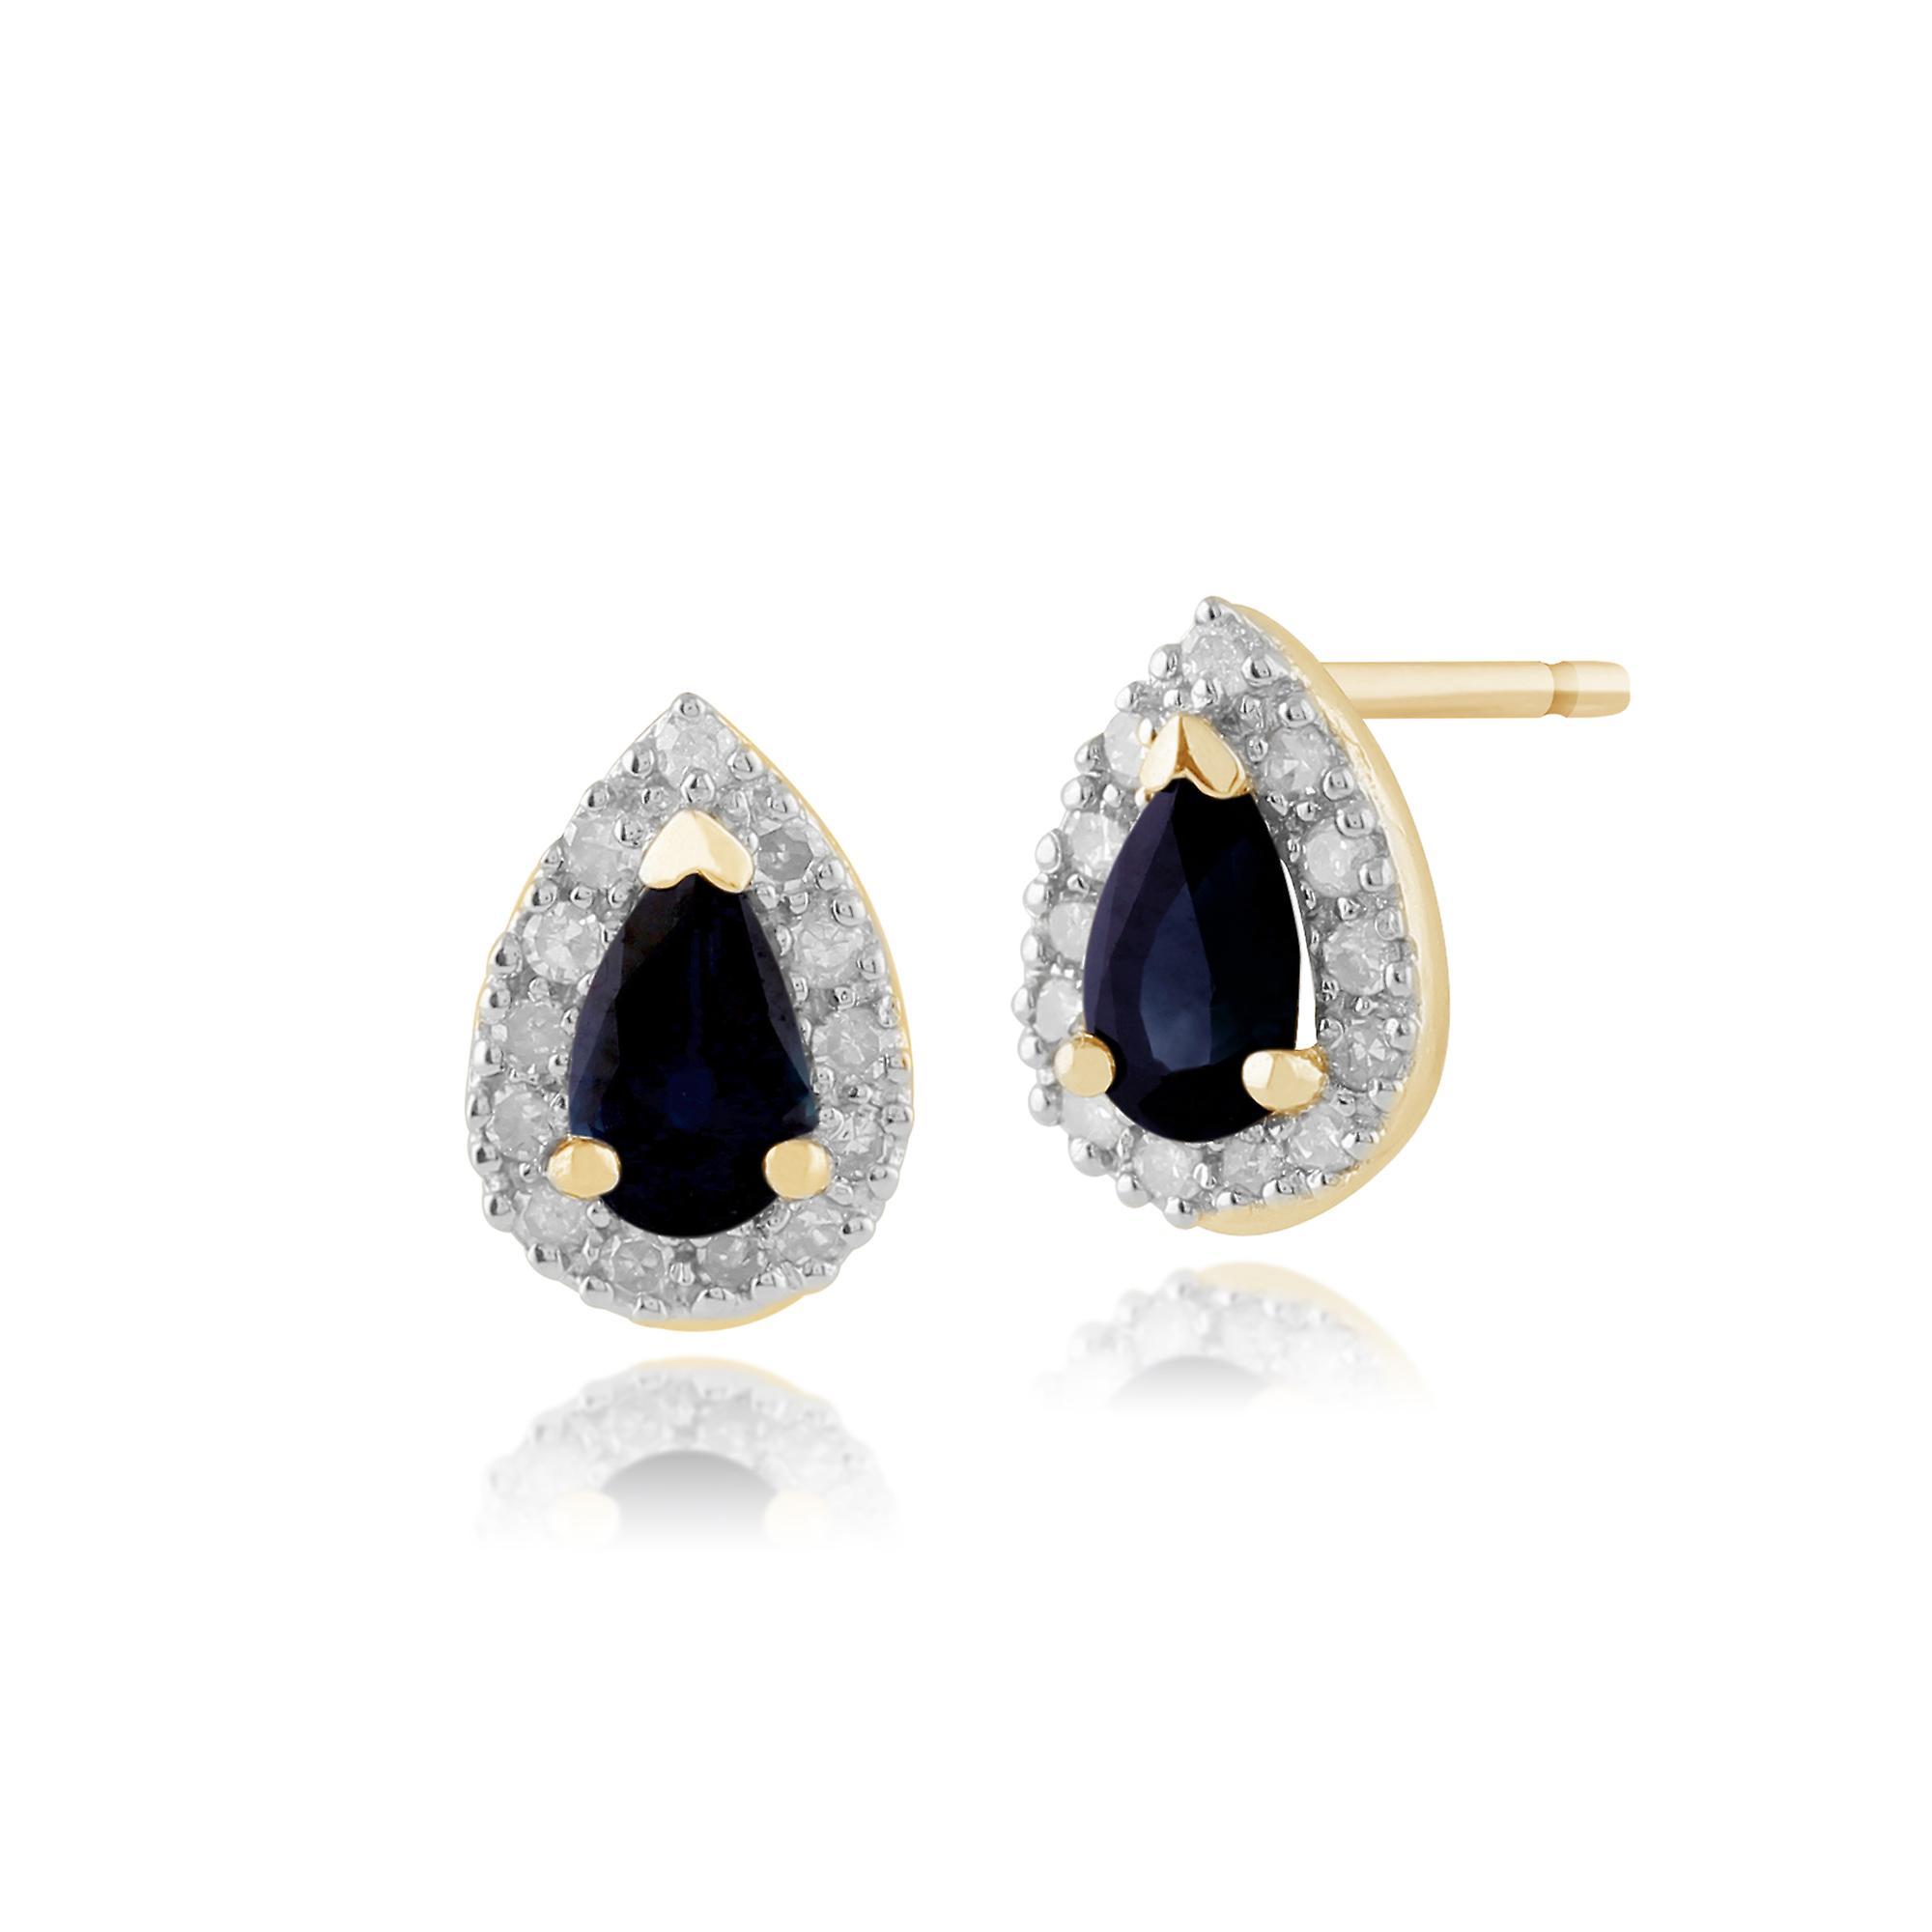 Gemondo 9ct Yellow Gold Sapphire & Diamond Pear Cluster Stud Earring & Ring Set